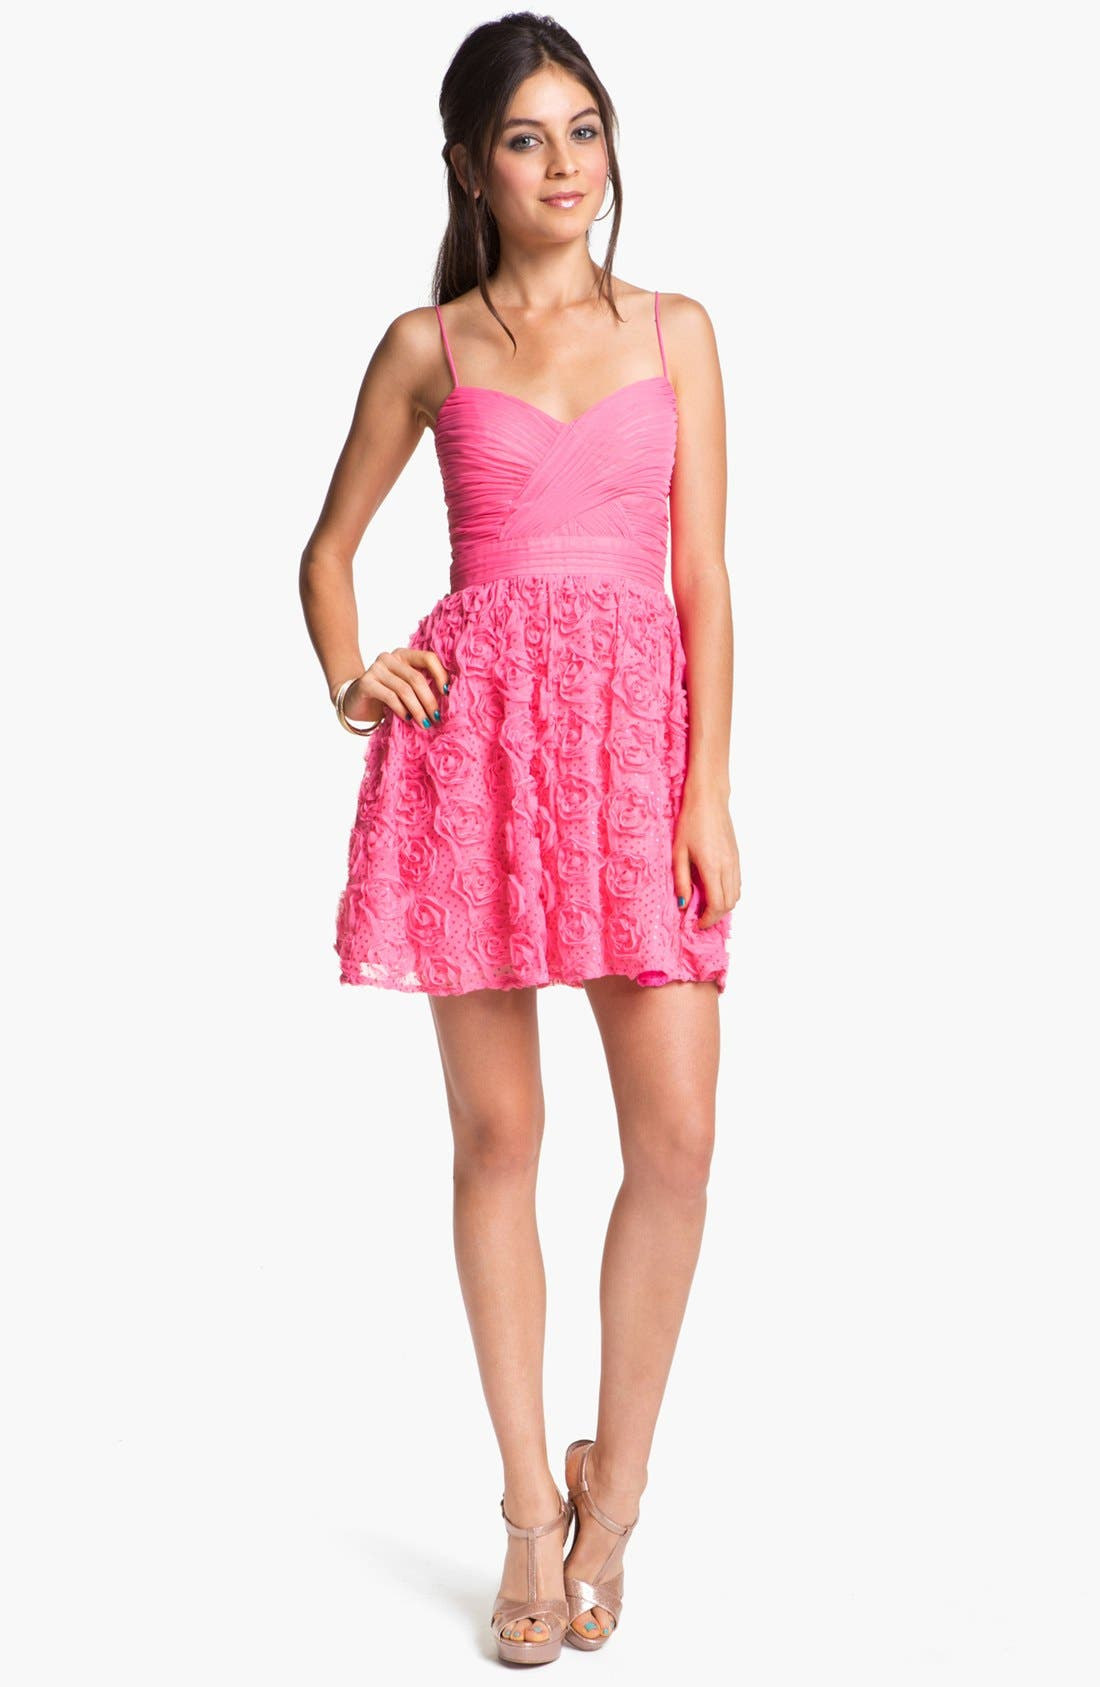 Alternate Image 1 Selected - Hailey Logan Rosette Party Dress (Juniors) (Online Only)